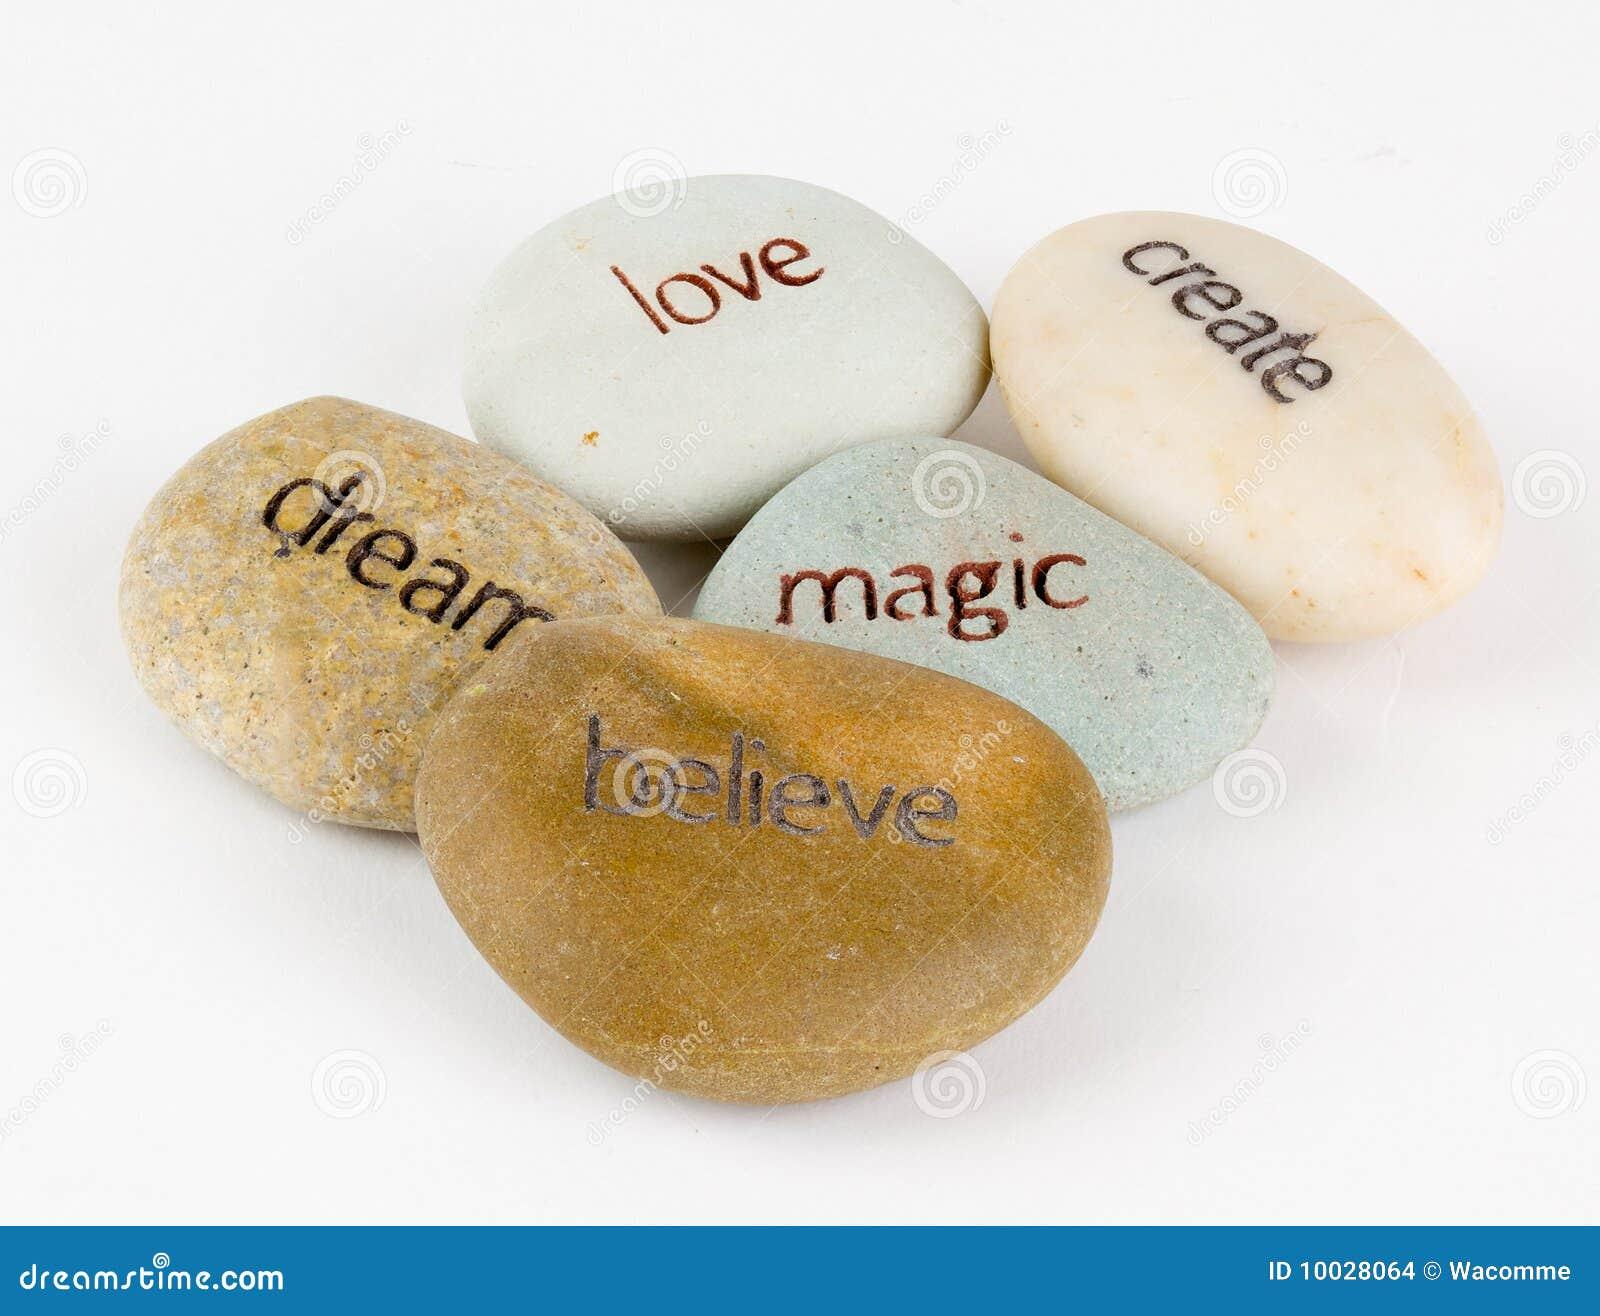 Why dream of stones 92